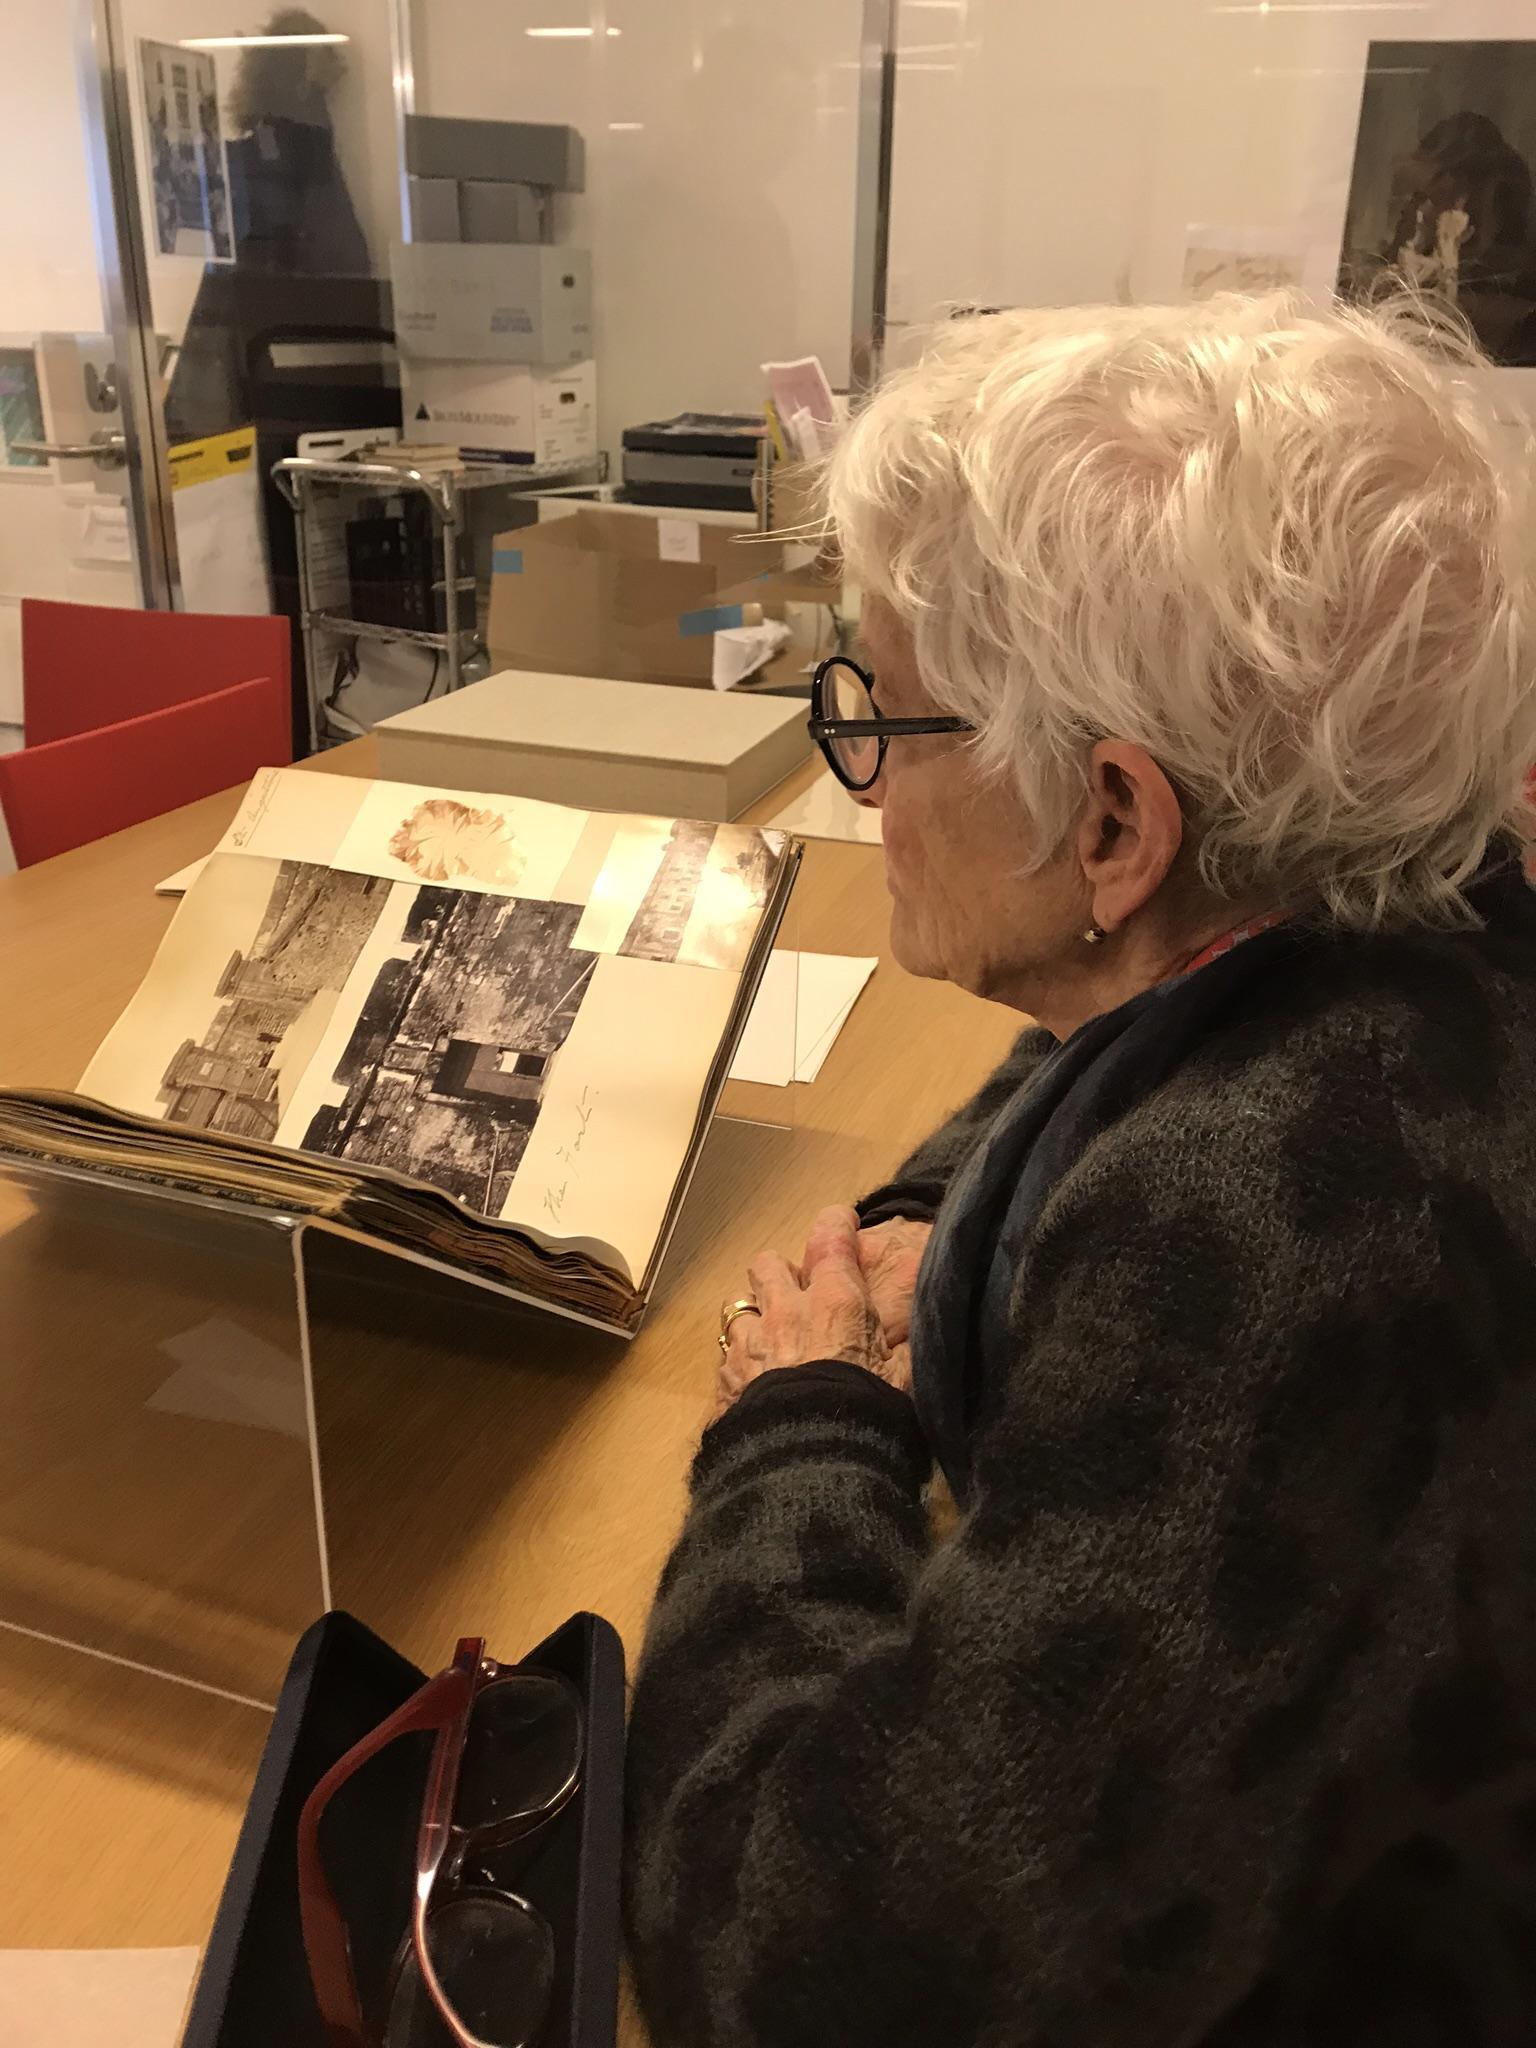 Joan Jonas looking at Isabella Stewart Gardner's travels to Asia, 2017.